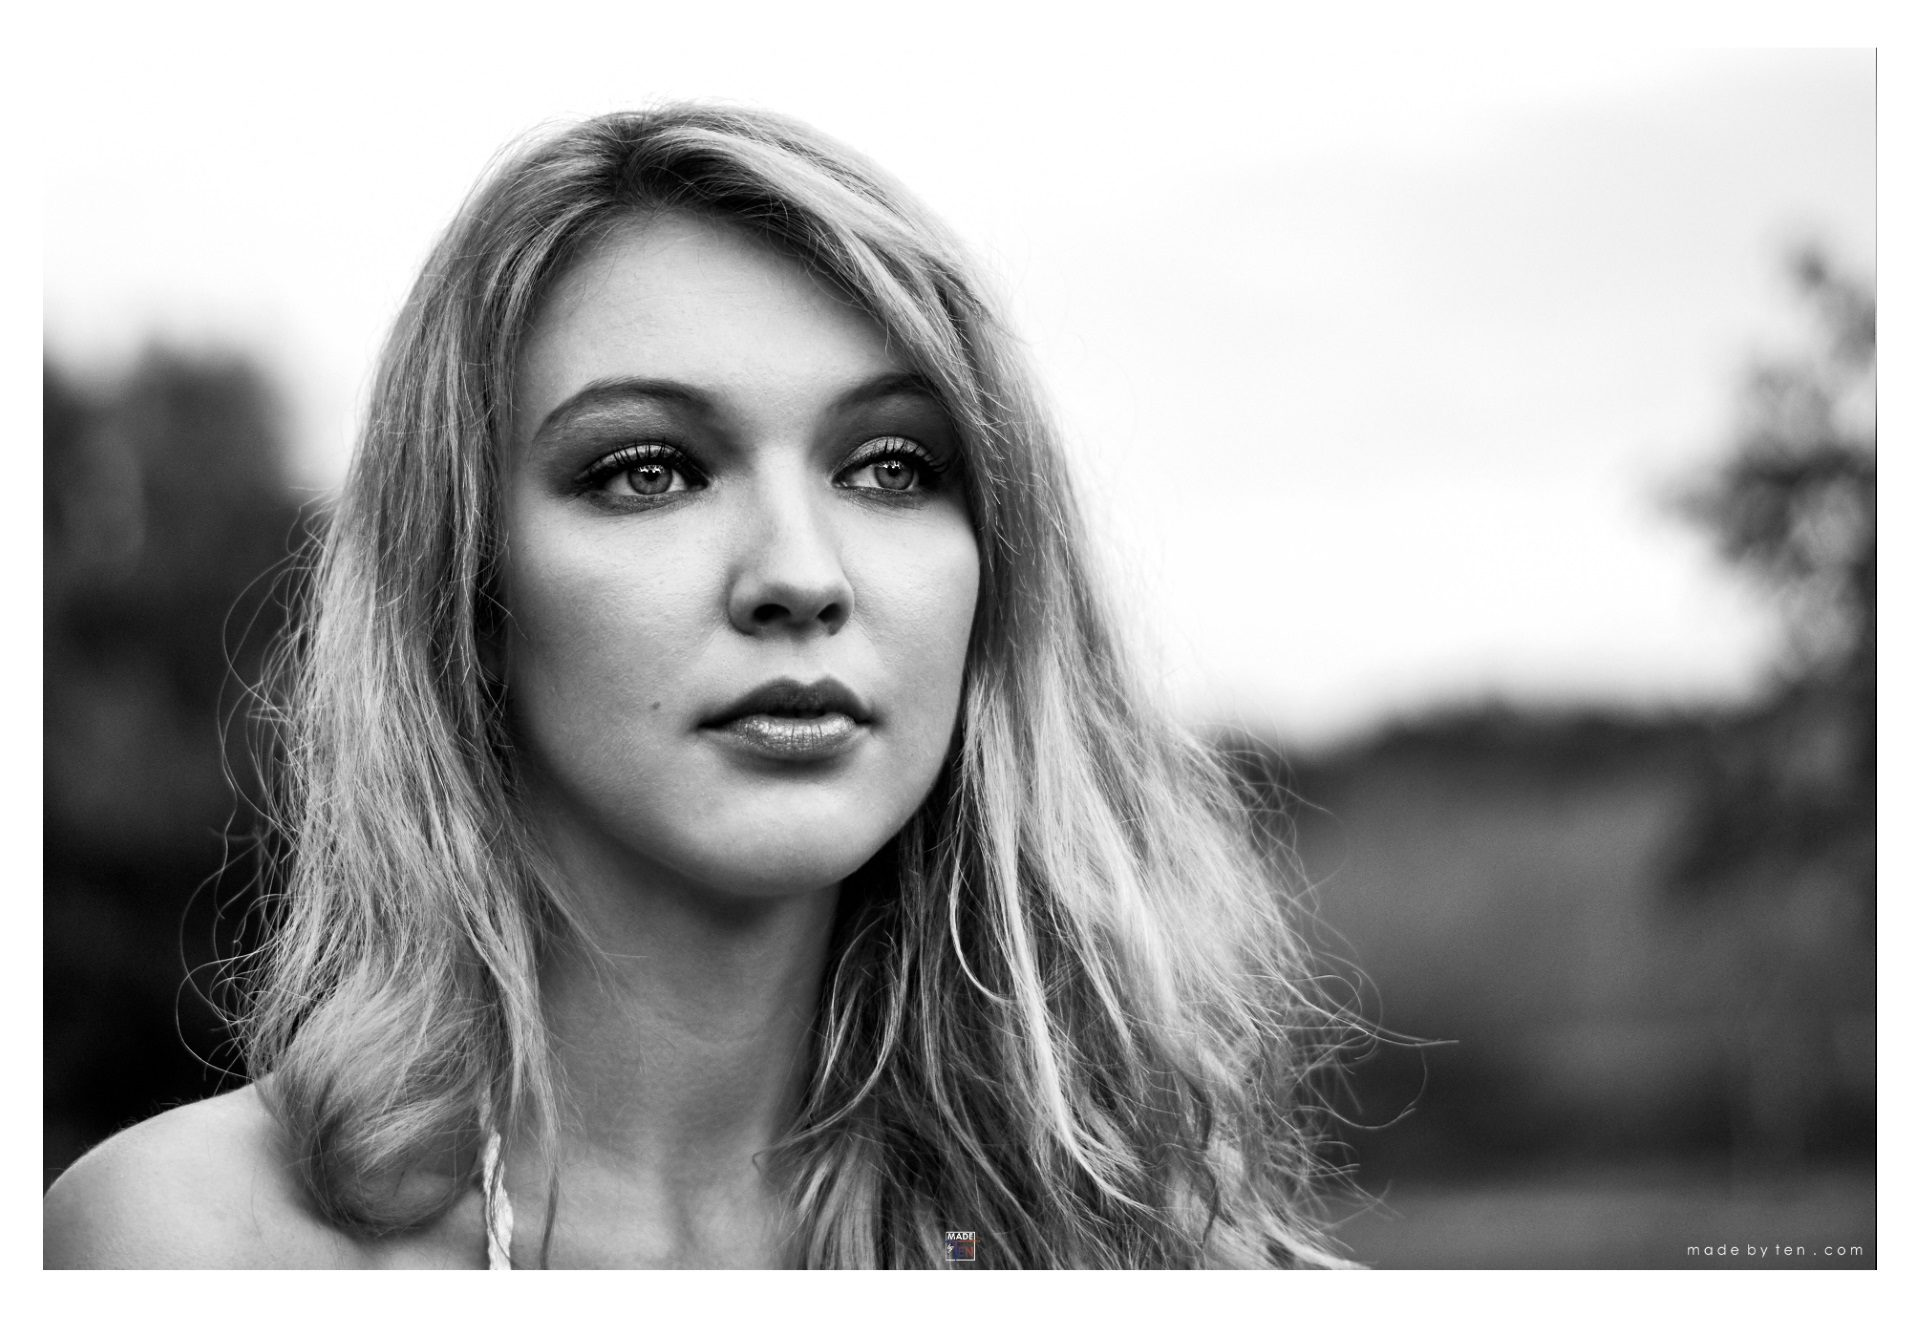 Woman Classic Headshot - GTA Women Portrait Photography